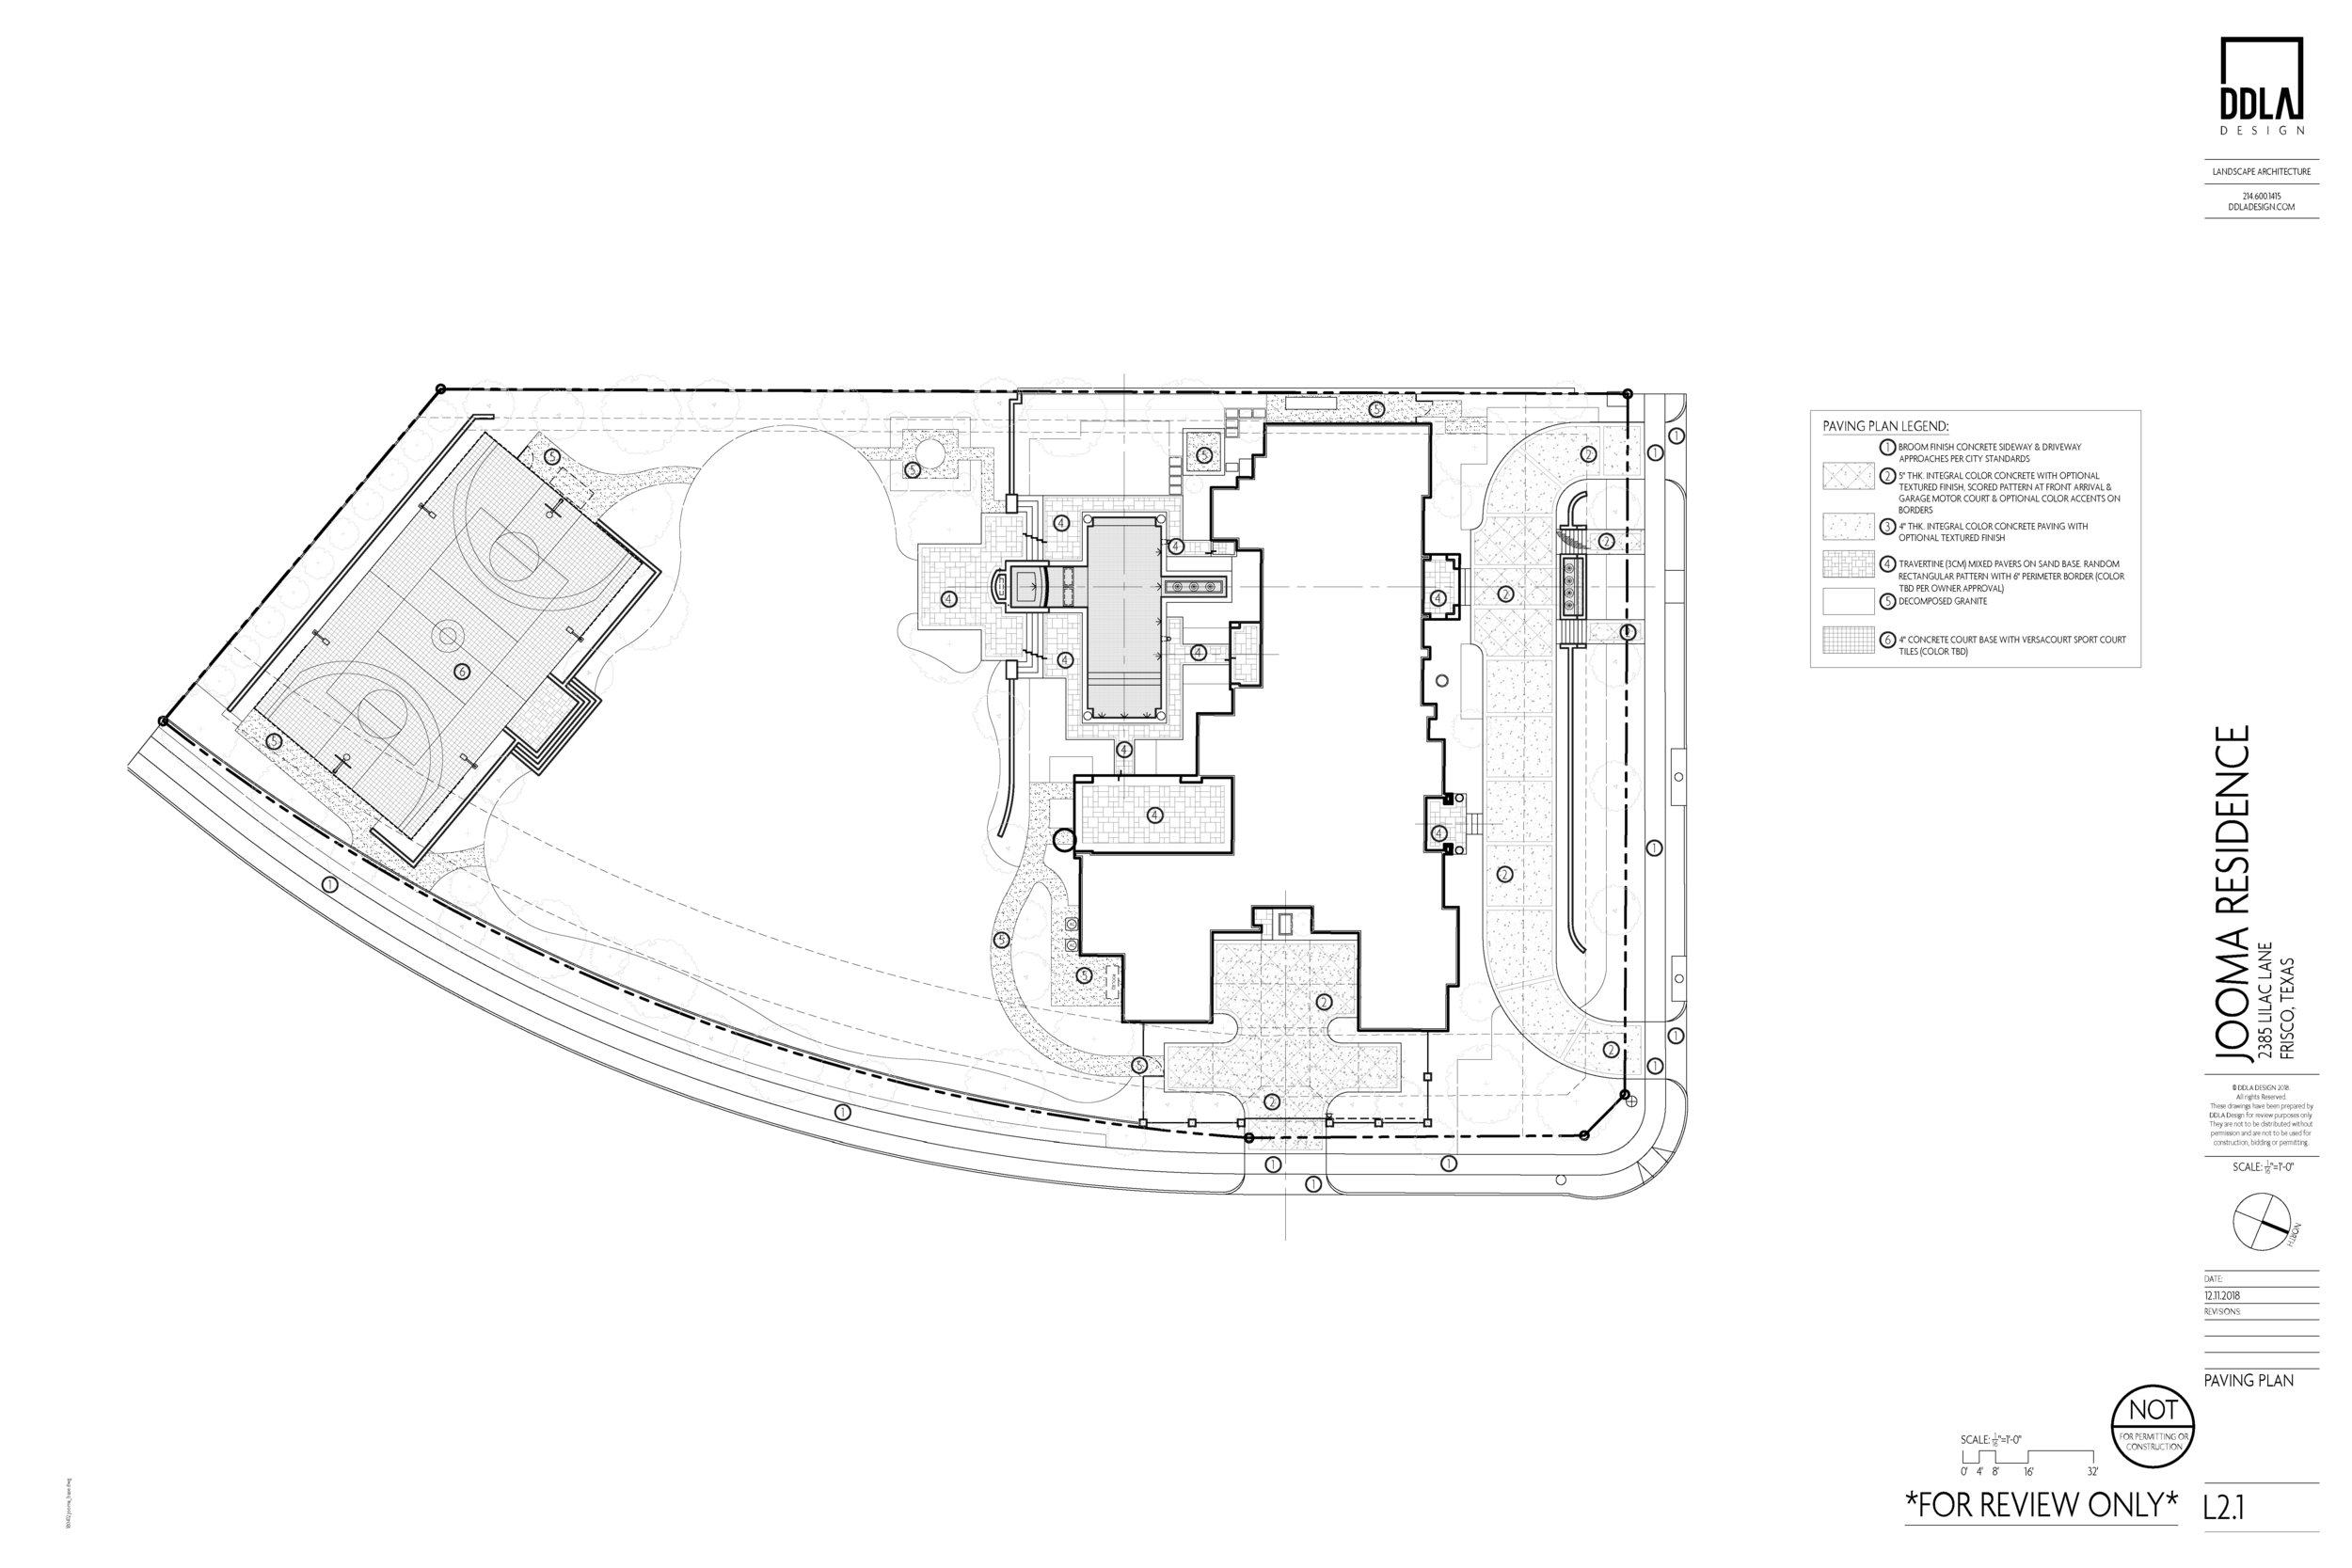 181211 jooma_final drawing package (owner)_Page_05.jpg